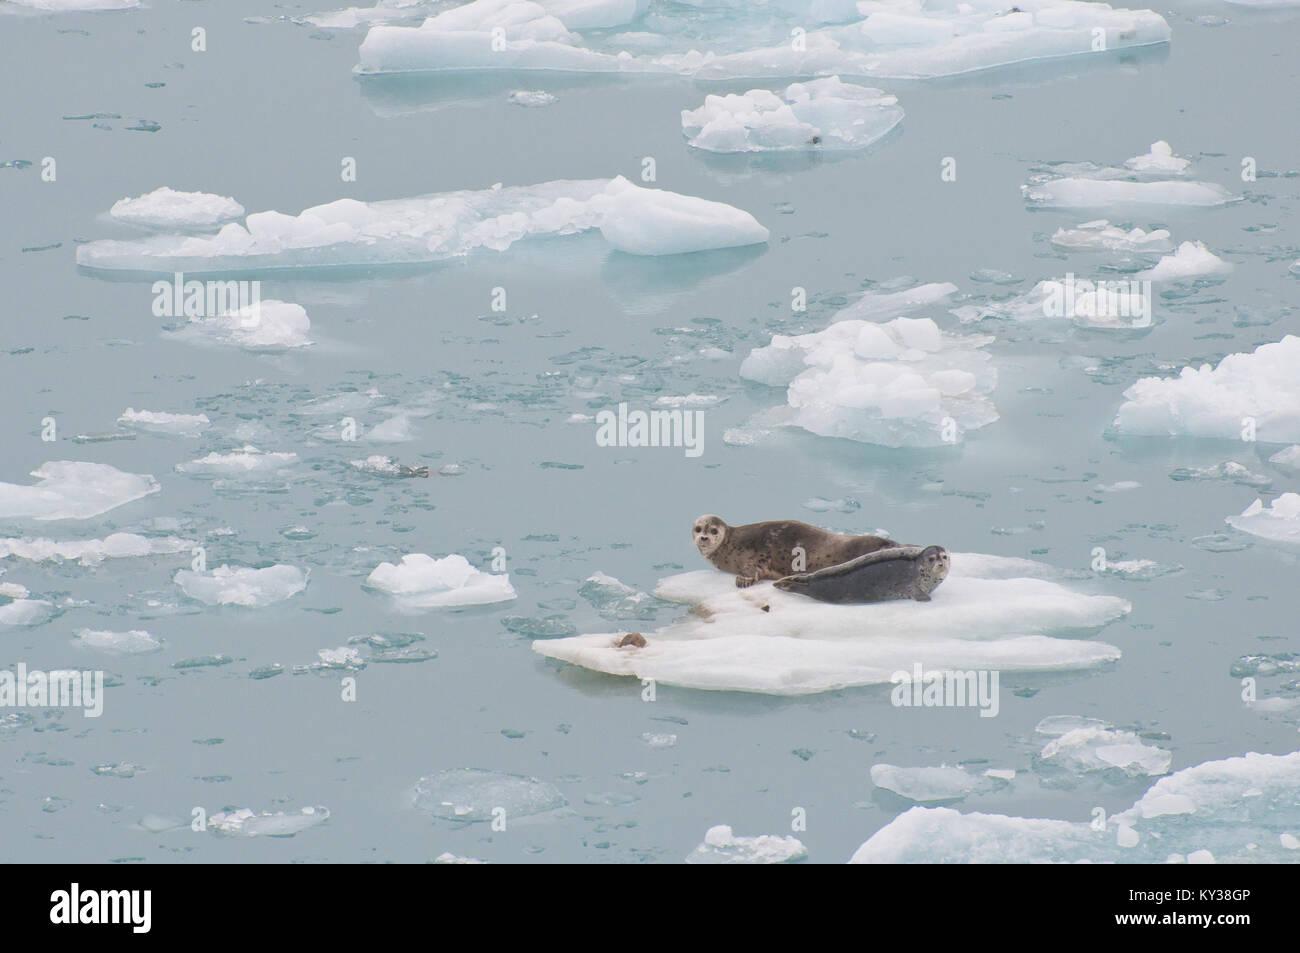 Wild seals resting on floating iceberg on sea. Stock Photo